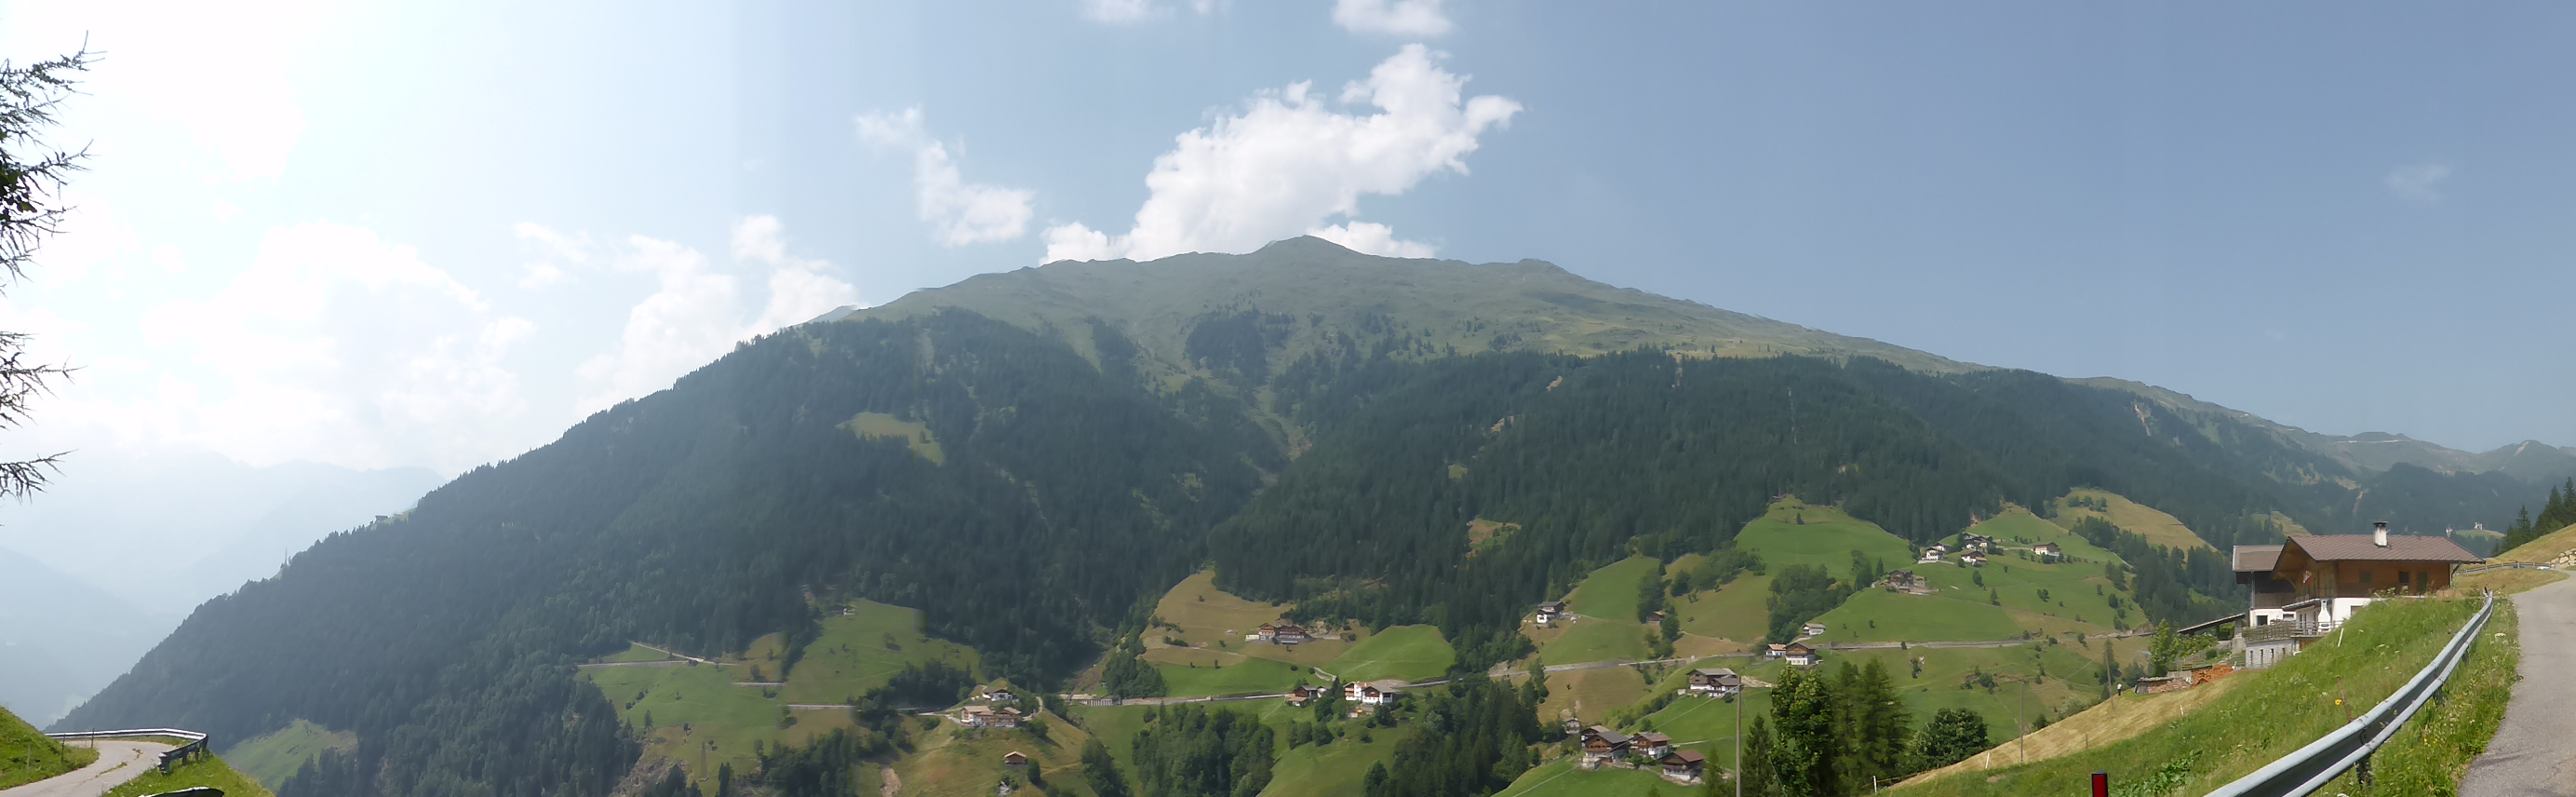 Richtung Passeiertal  St. Leonhard